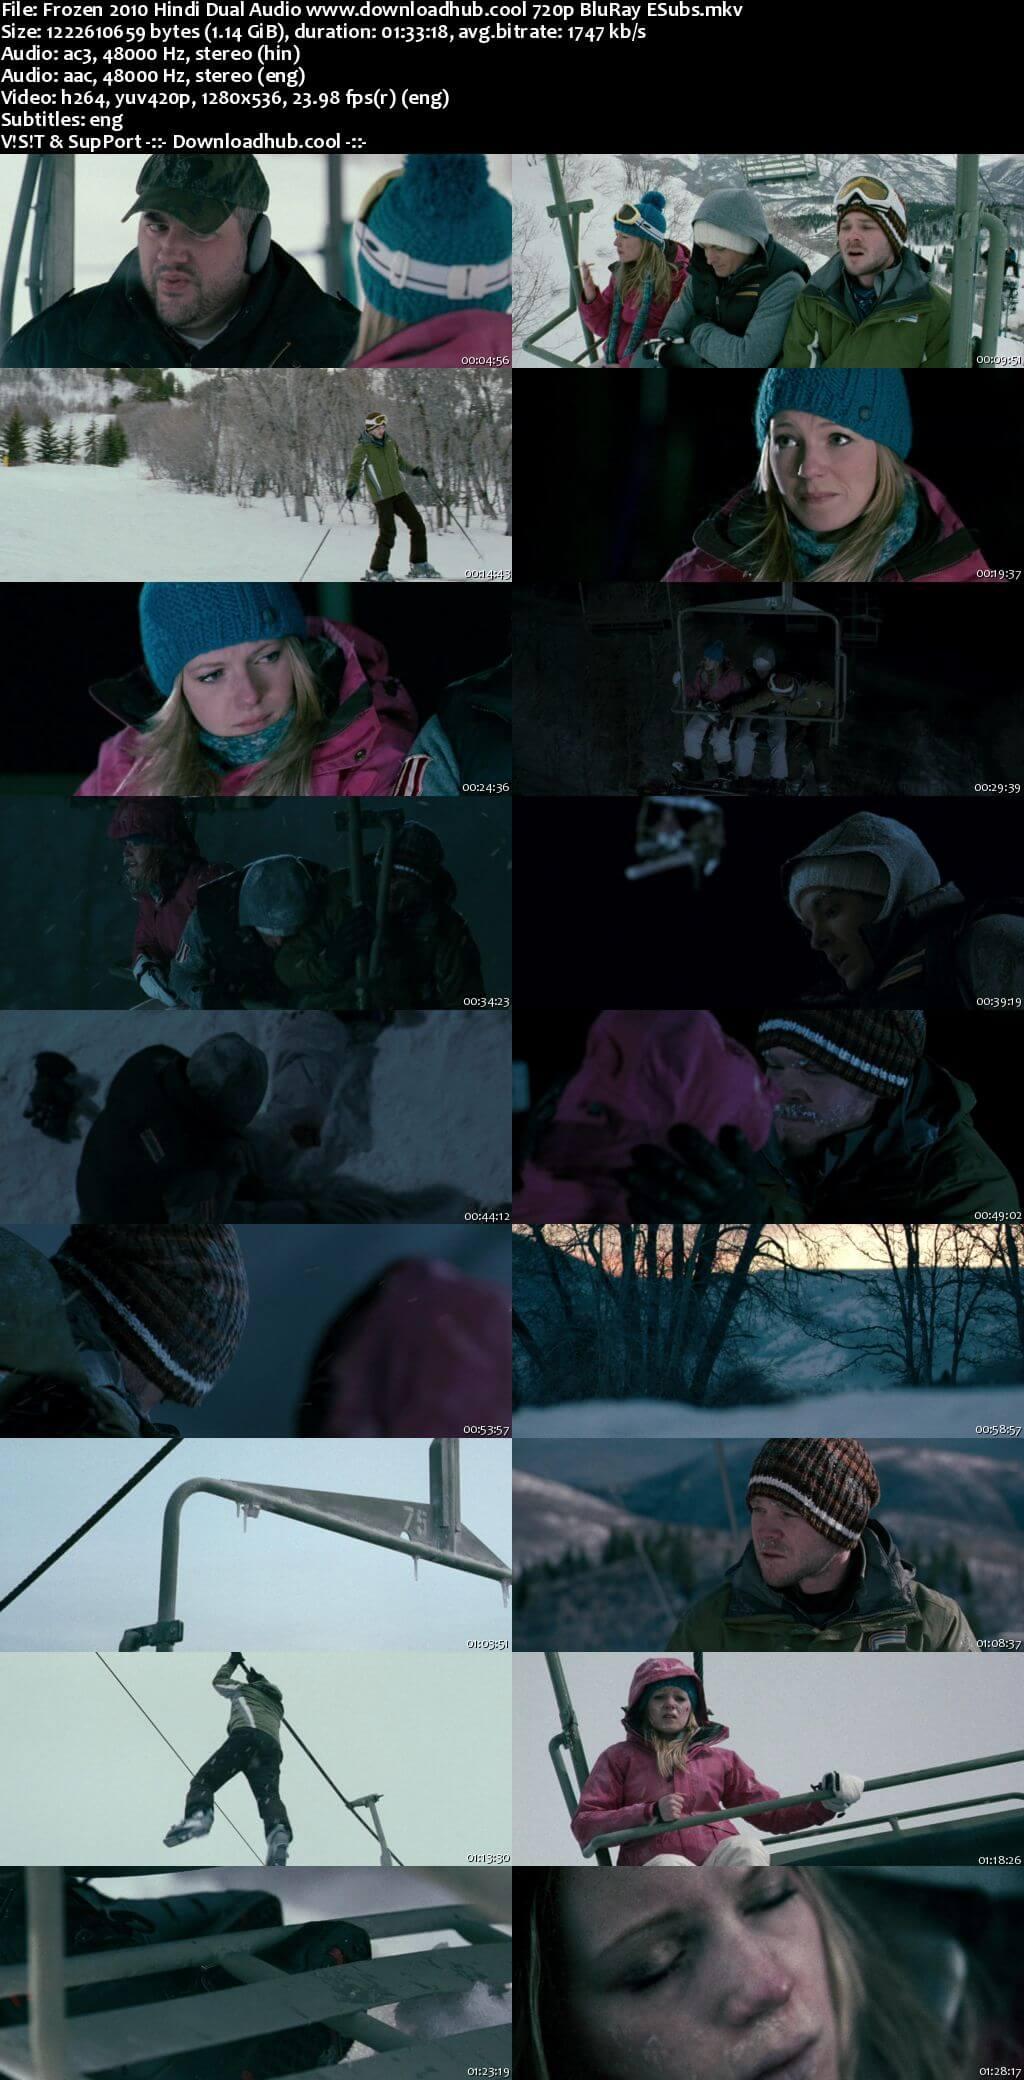 Frozen 2010 Hindi Dual Audio 720p BluRay ESubs